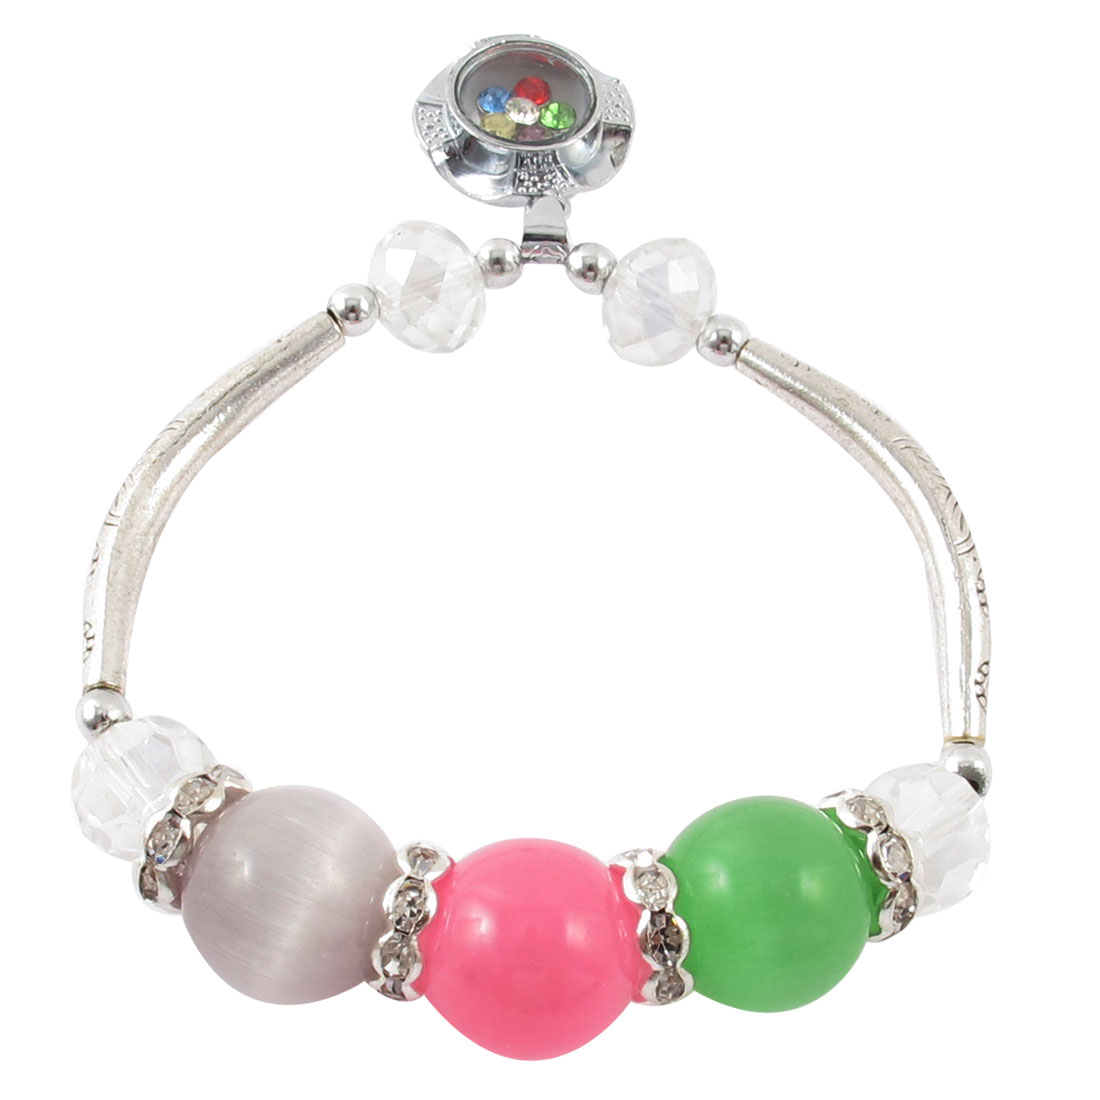 Lady Faux Cat Eyes Stone Adornment Pendant Stretchy Bracelet Green Pink Purple